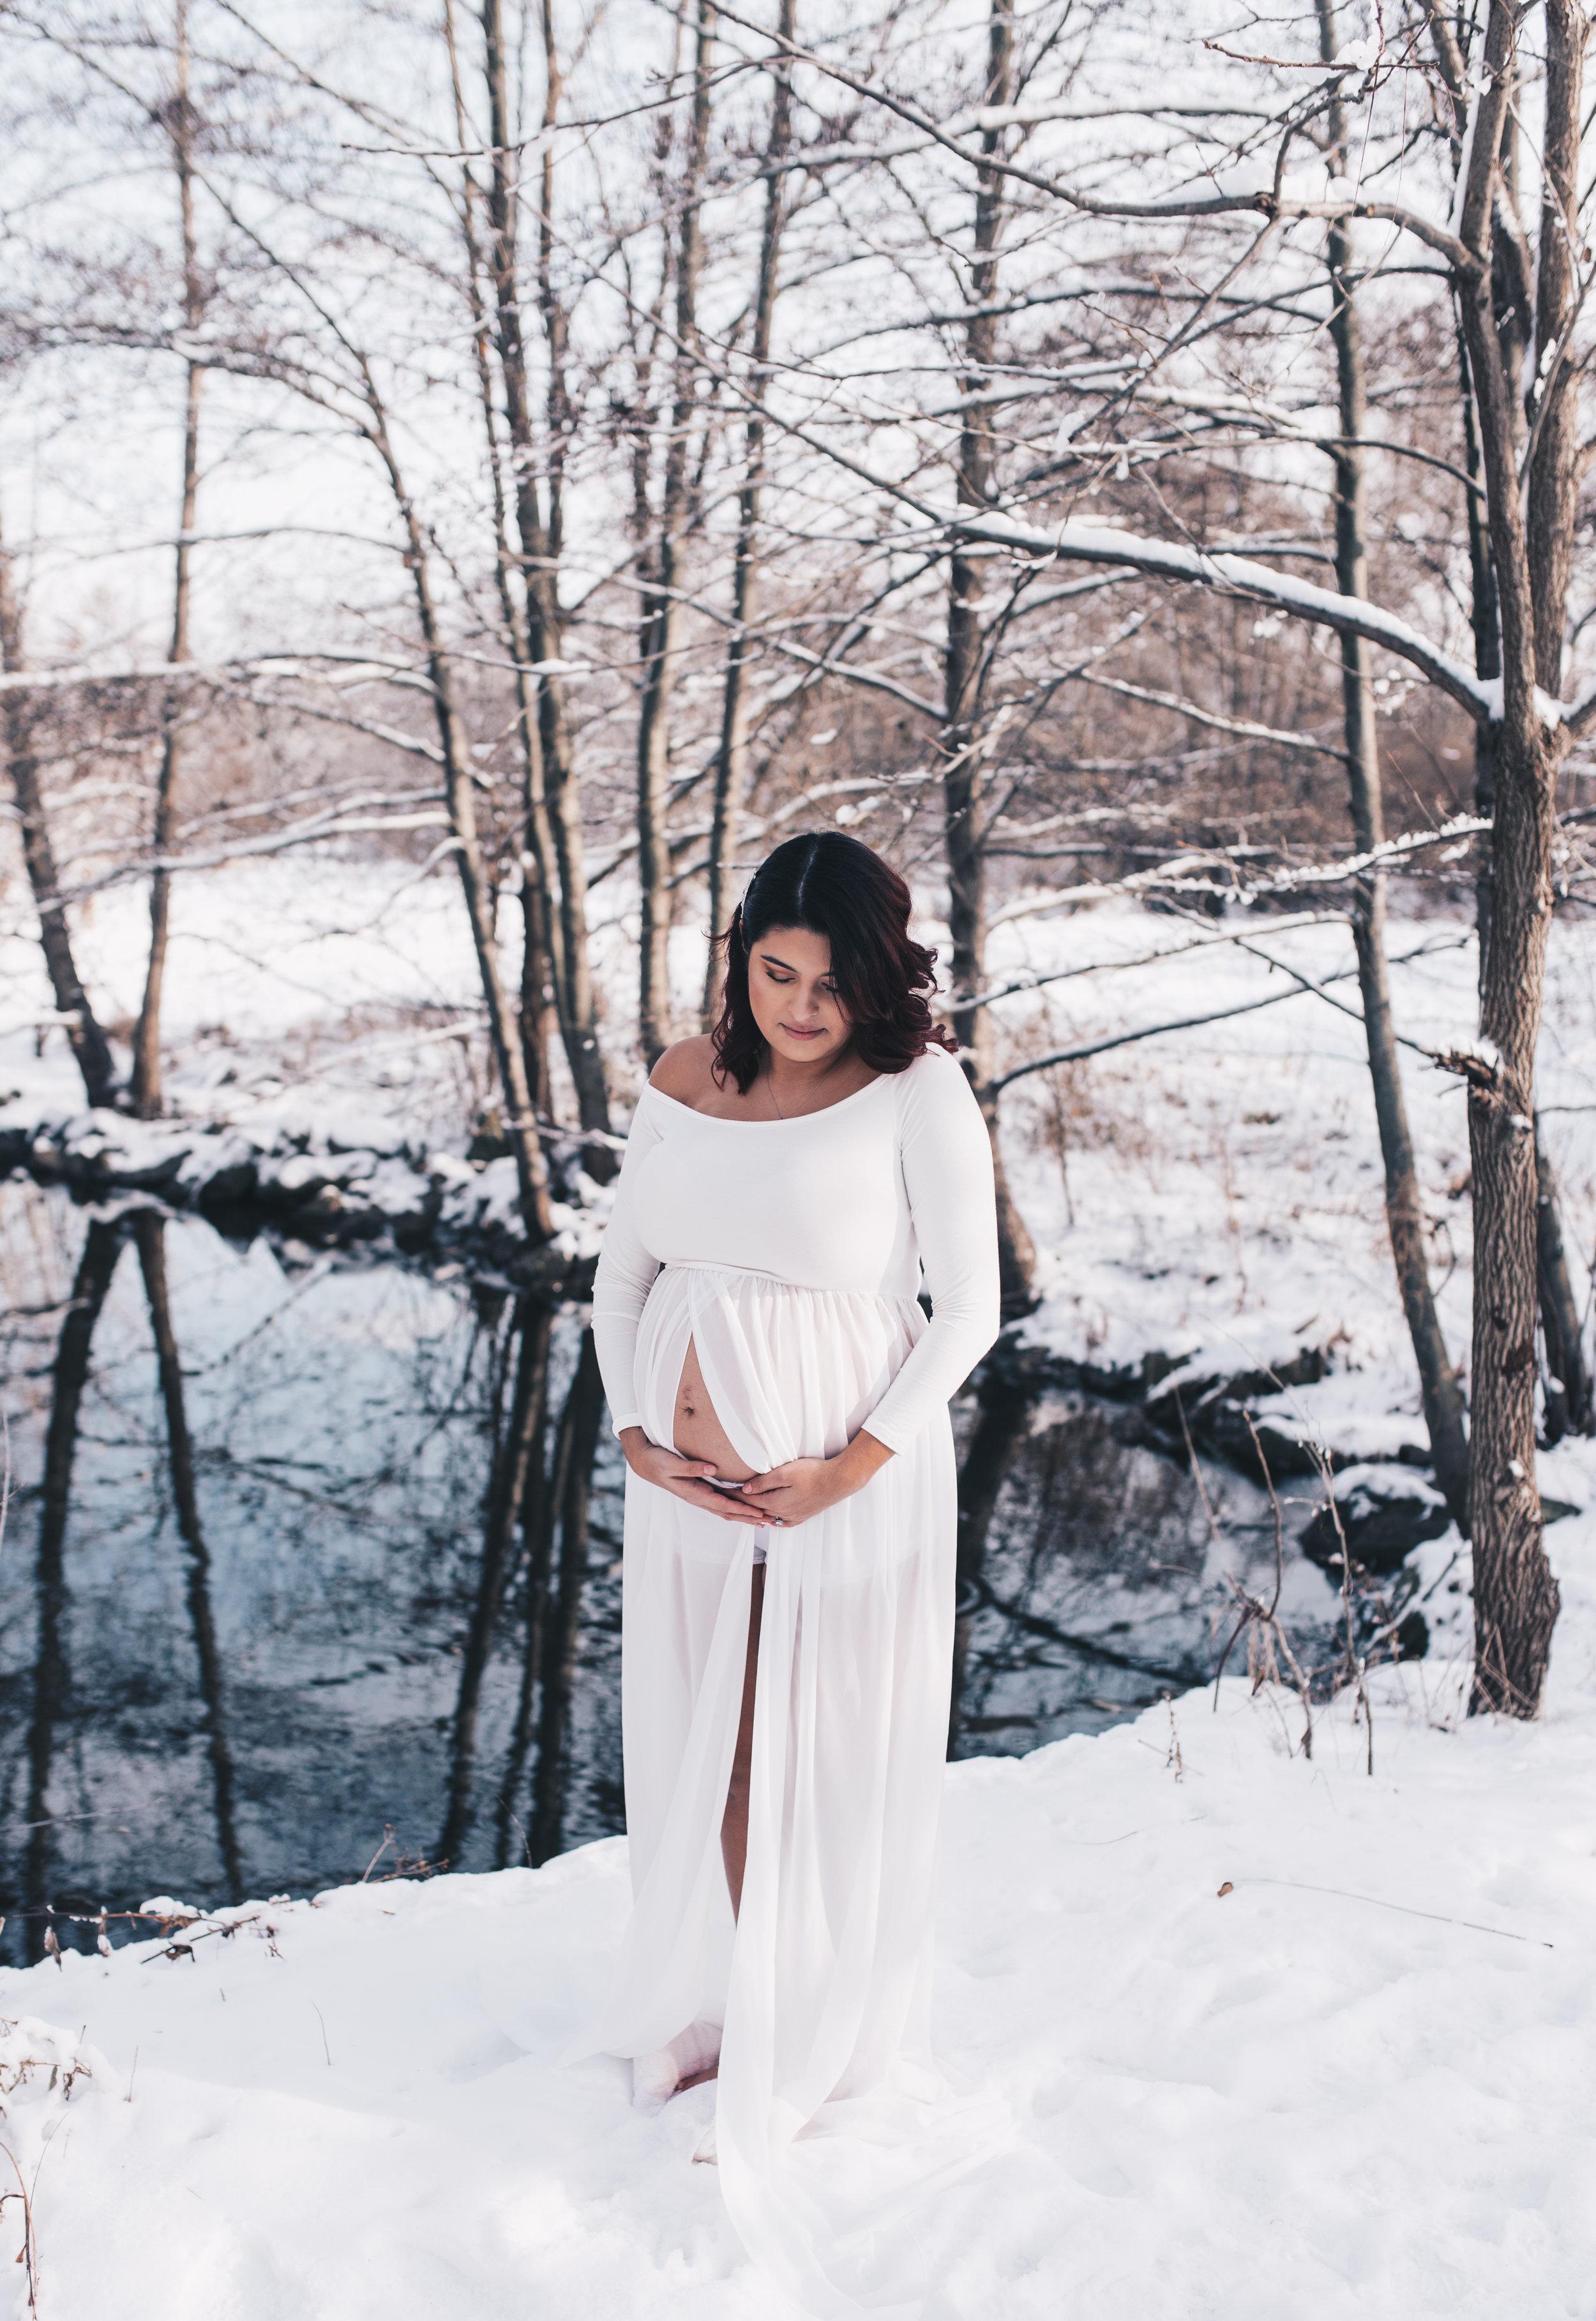 Outdoor Winter Maternity Session Julia Maruyama Photography I Illinois Wedding Photographer